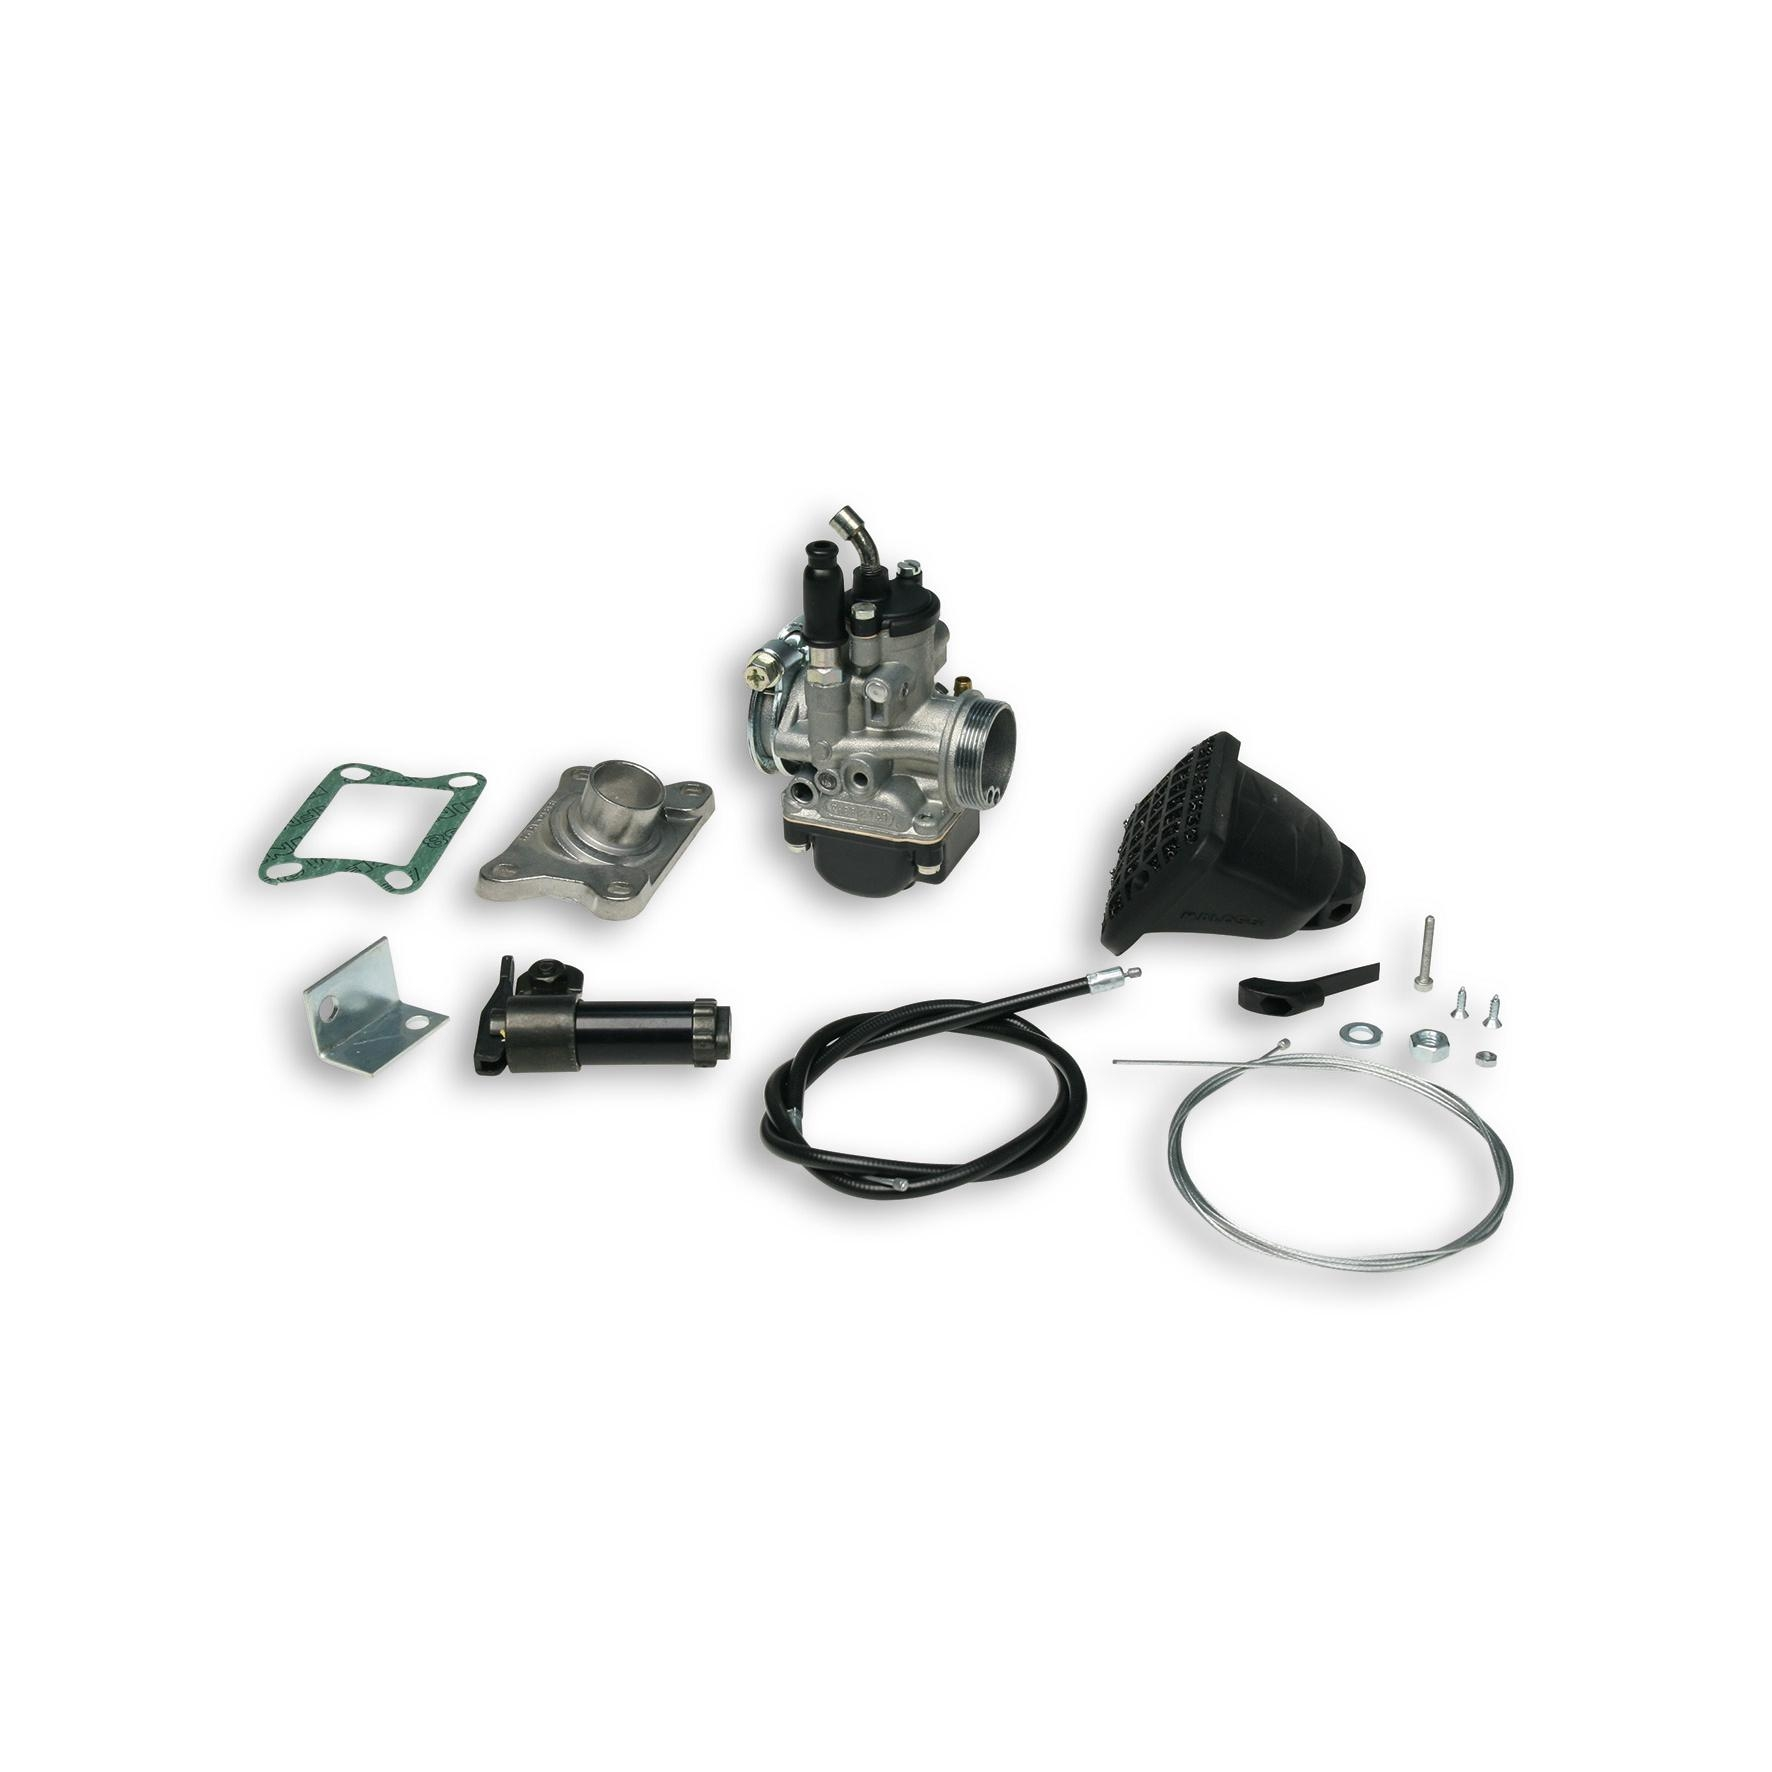 Kit carburateur Malossi PHBG 21 Malaguti Fifty Top 50